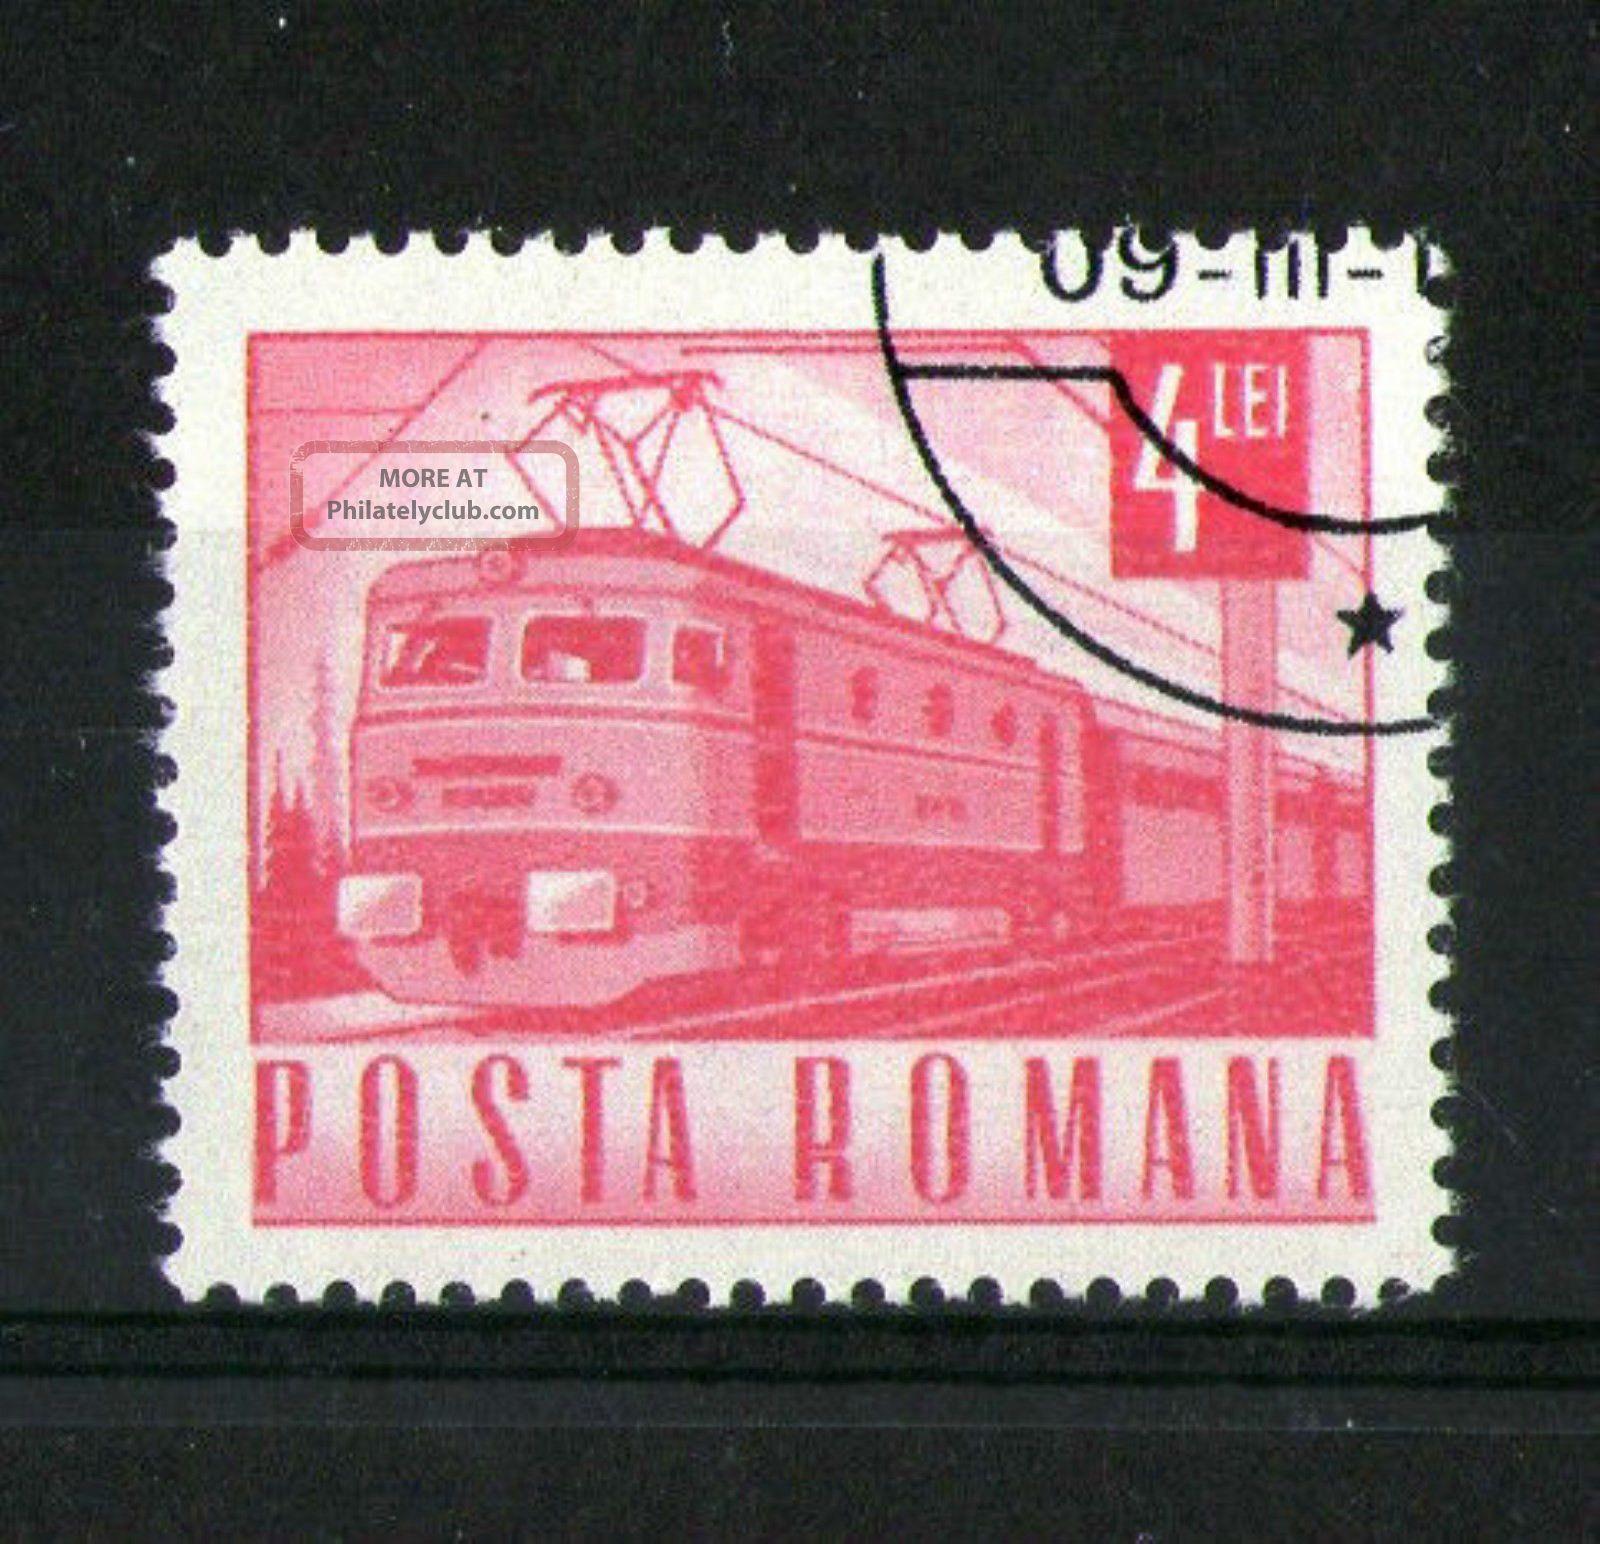 Romania 1967 Electric Locomotive Commemorative Stamp Sg 3528 Vfu Europe photo